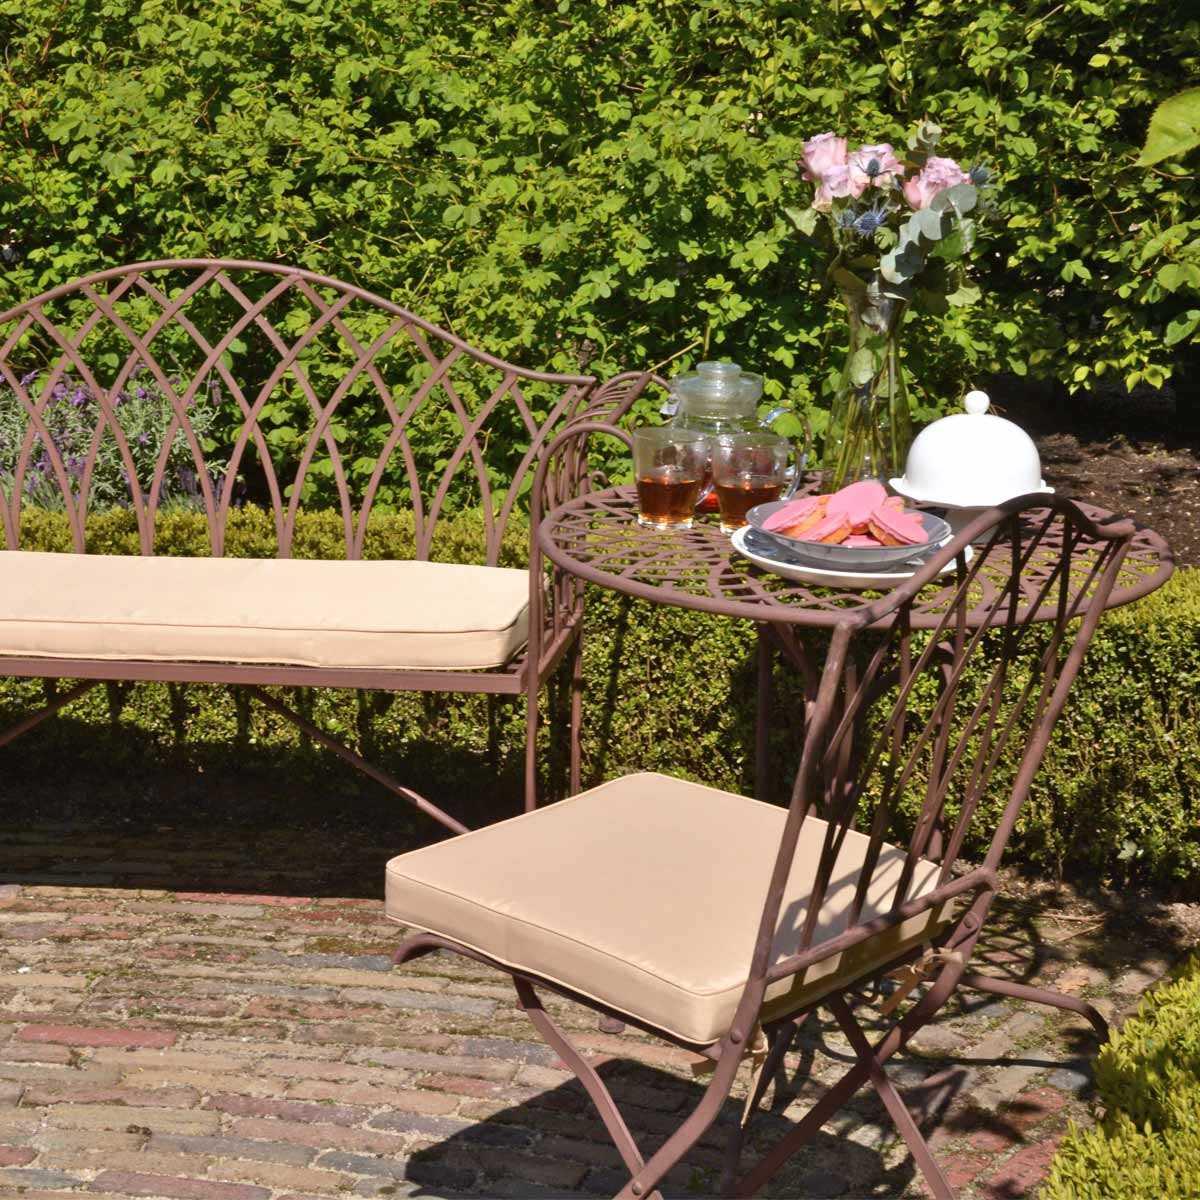 salon de jardin sophia en acier style fer forge vente au meilleur prix jardins animes